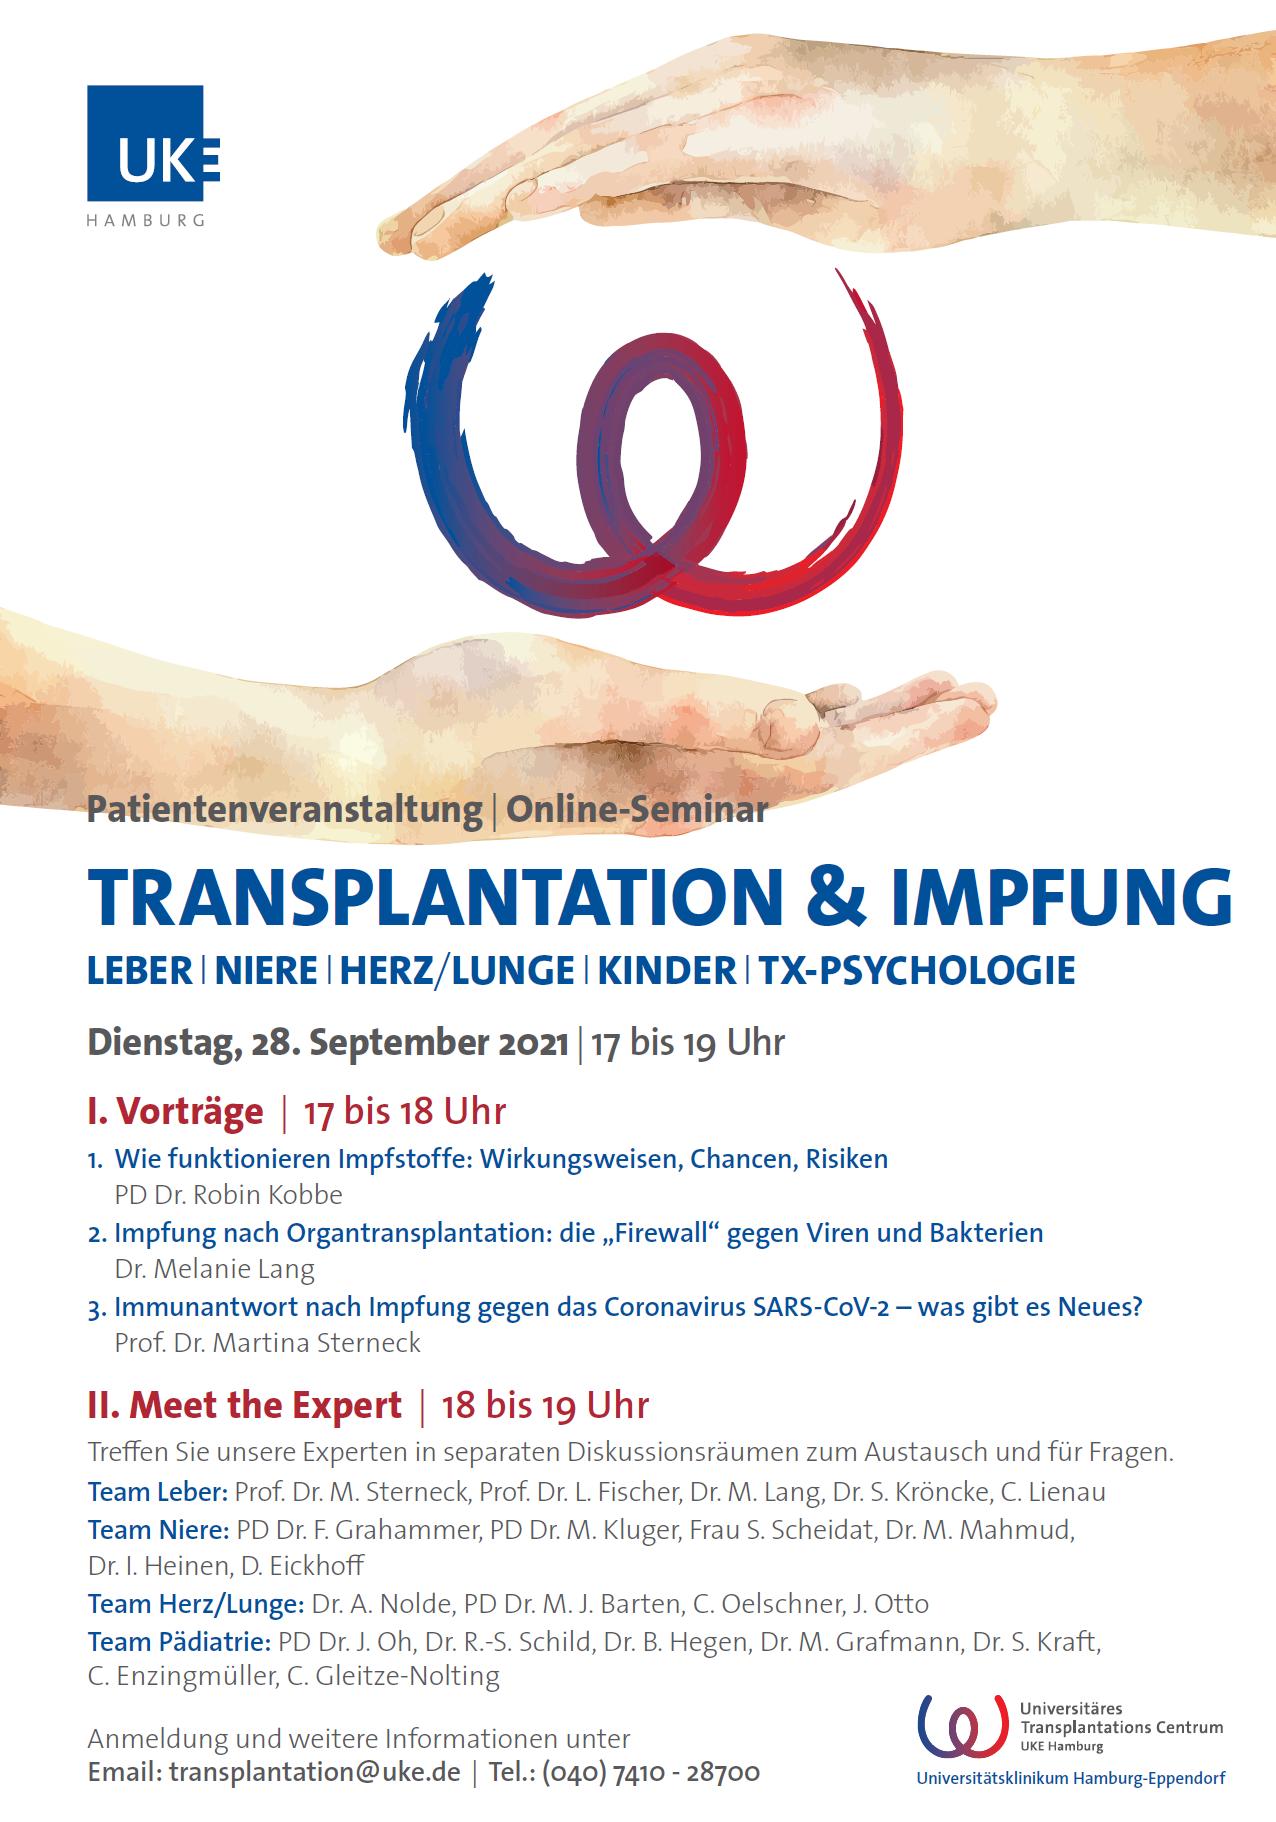 Transplantation & Impfung